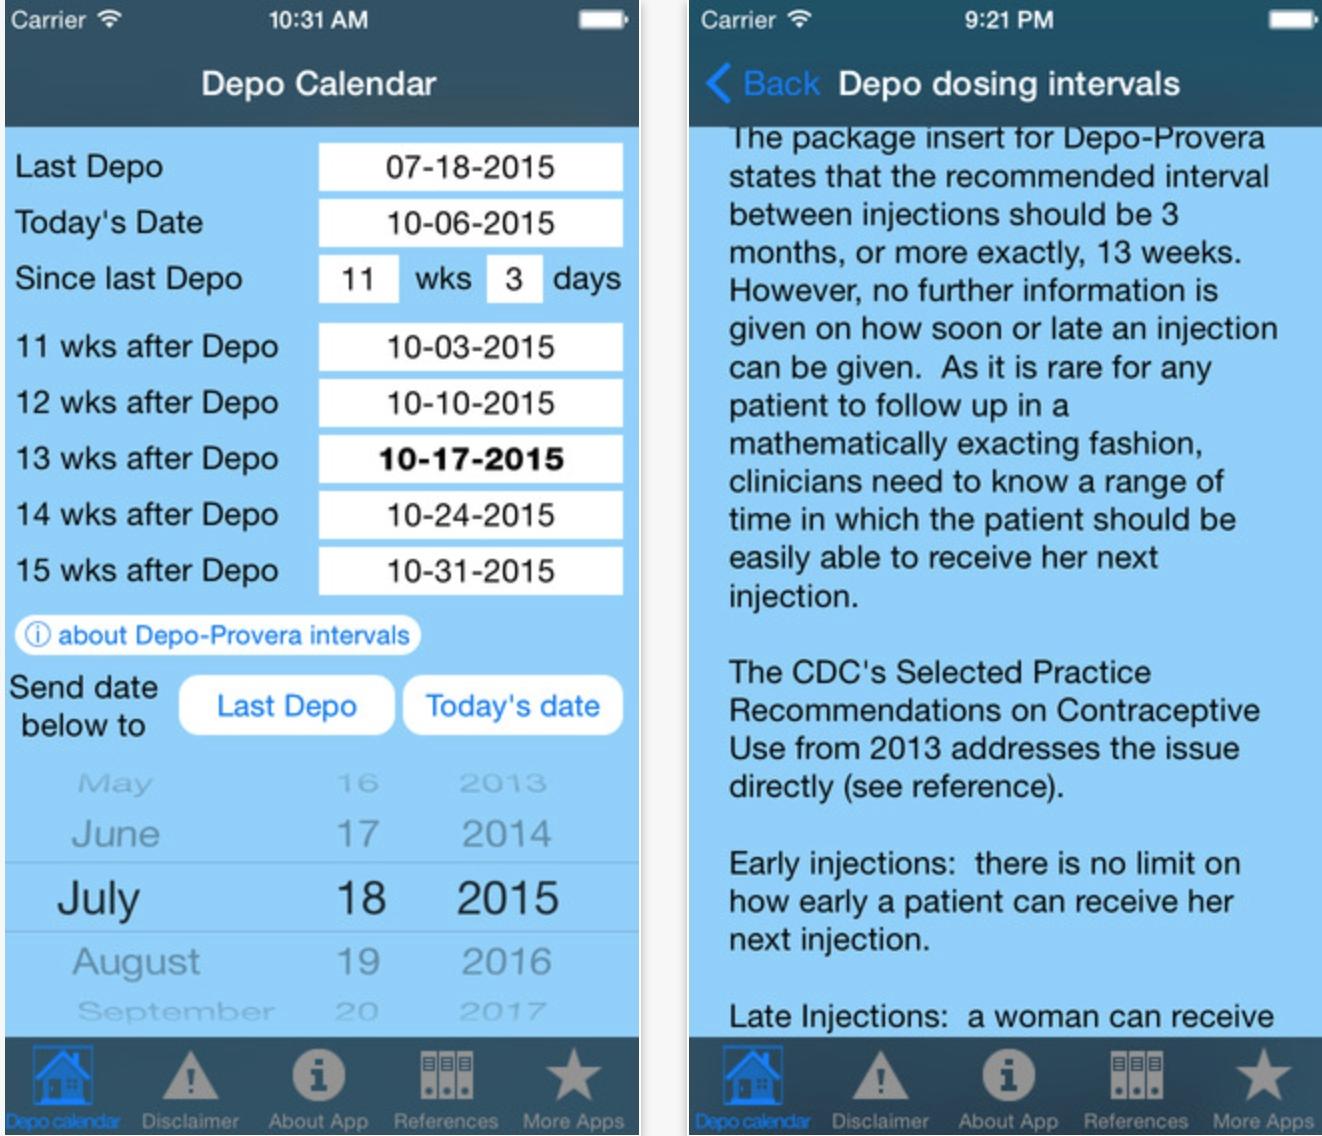 Depo Calendar App Could Significantly Improve Contraception  Next Depo Shot Calculator